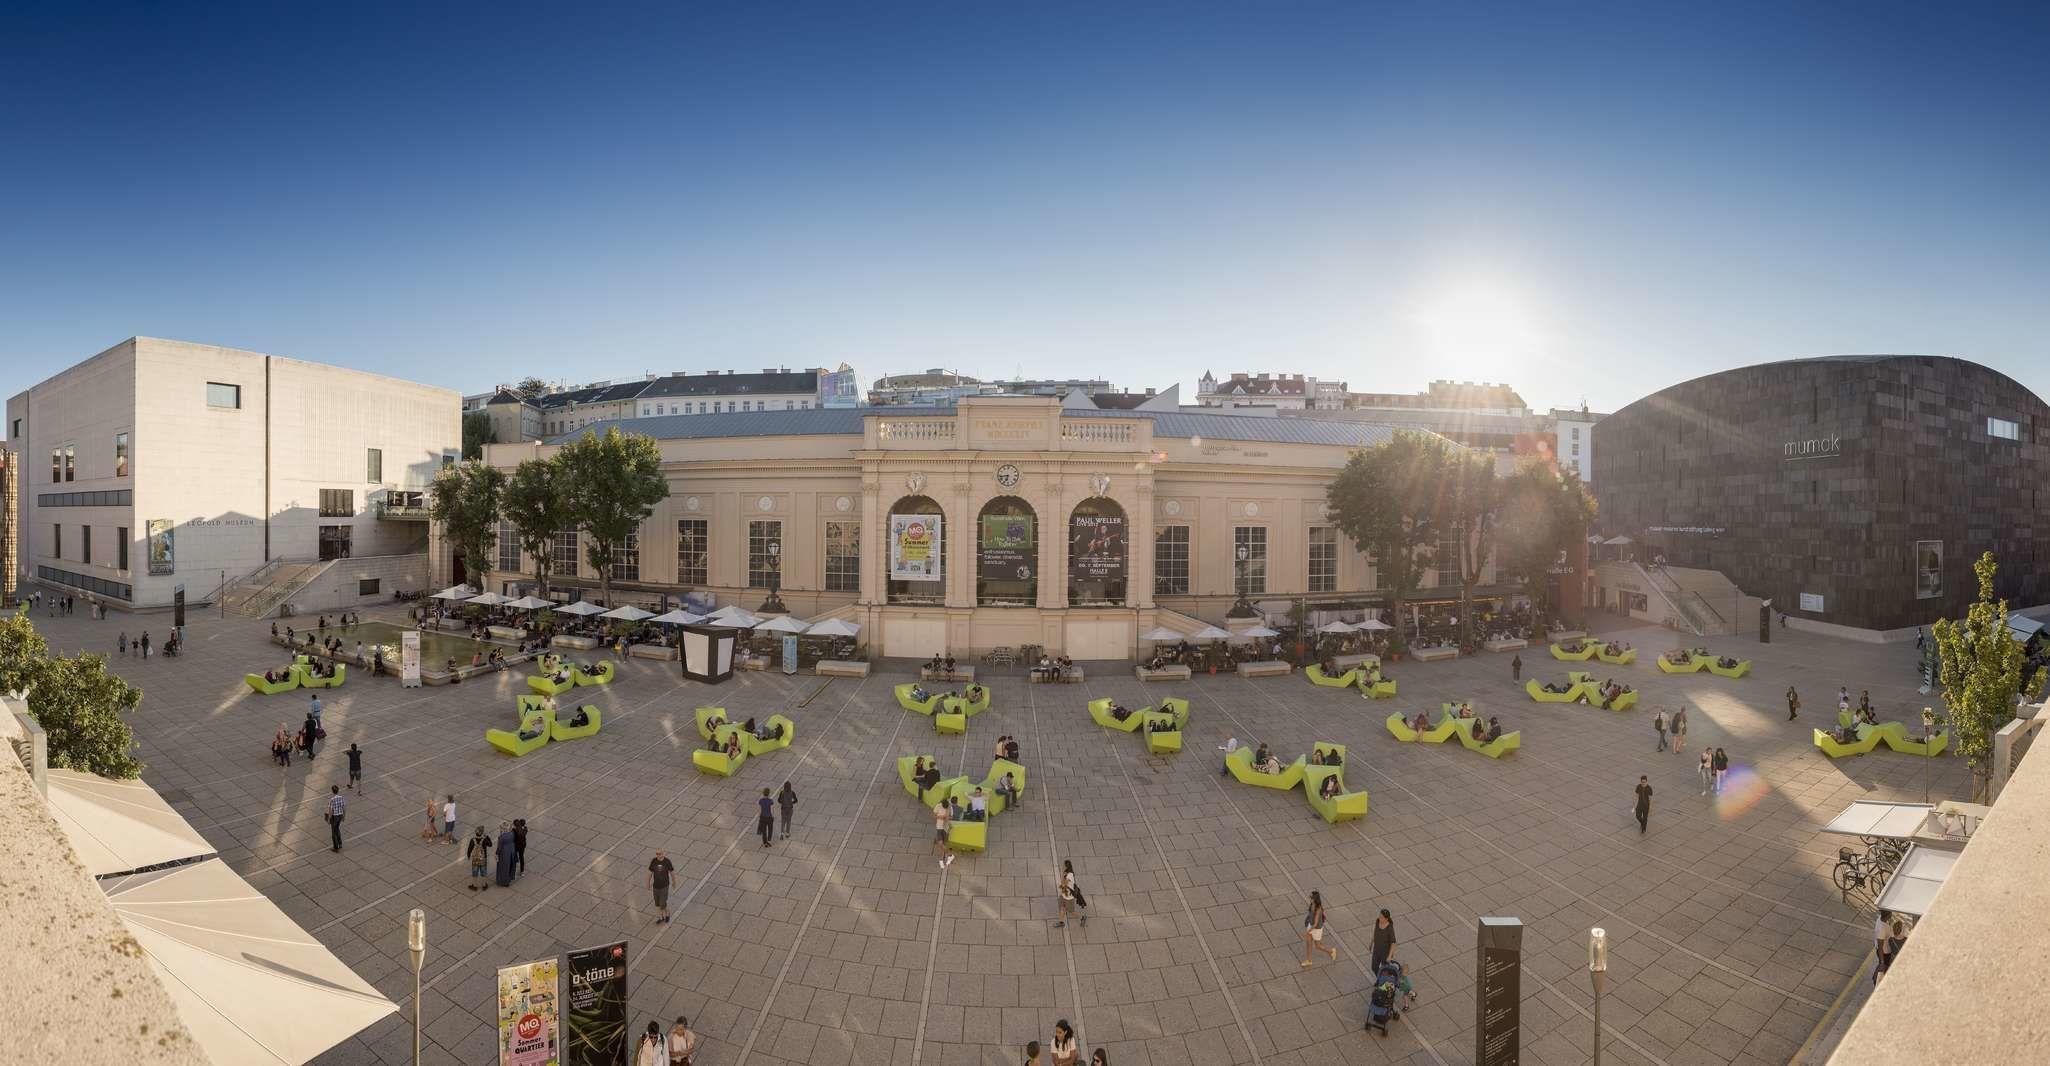 Vienna: 1–Hour MuseumsQuartier Guided Site Tour